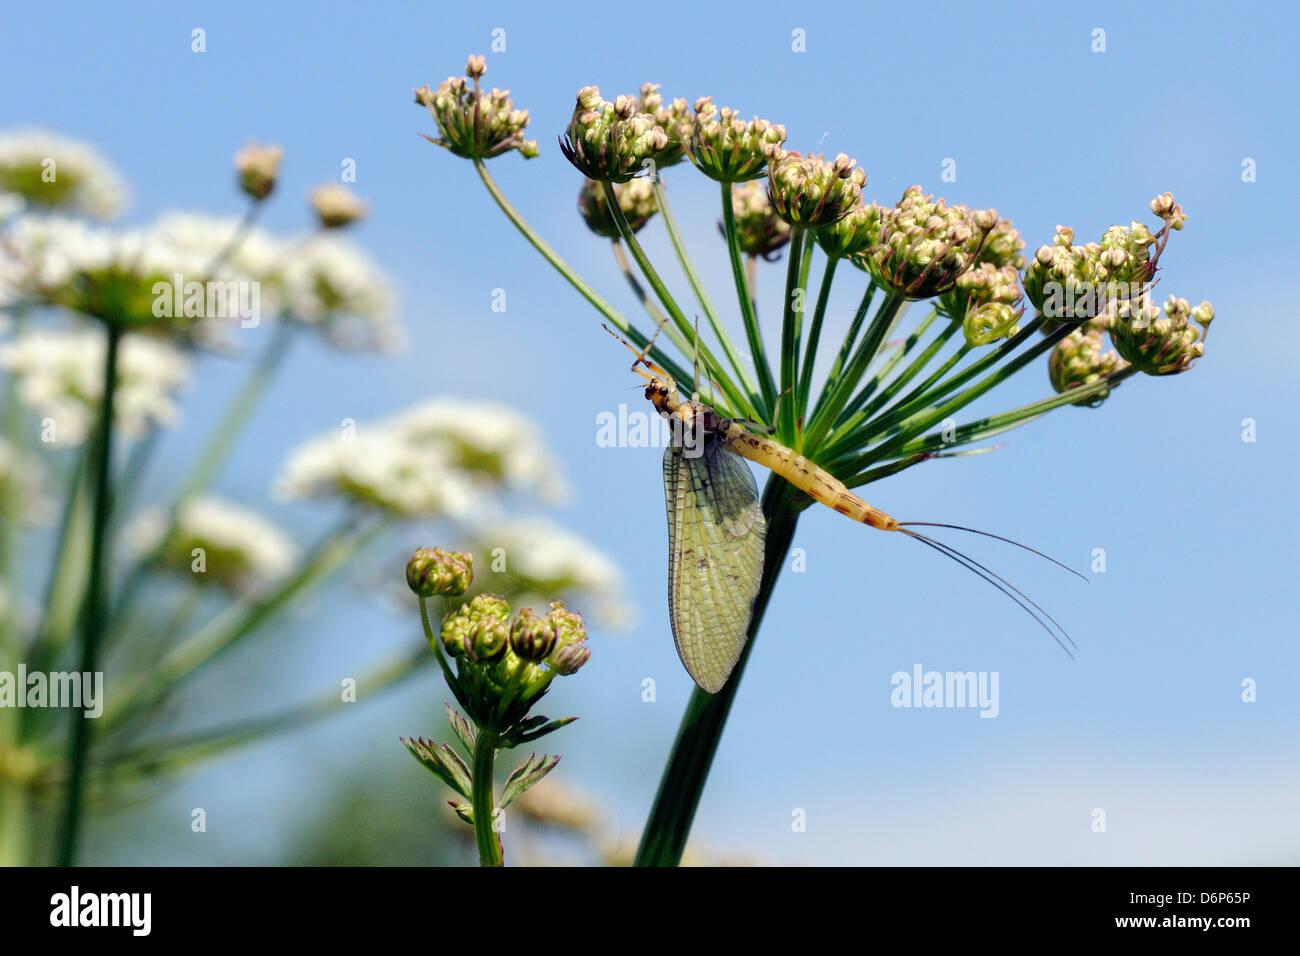 Green drake mayfly (Ephemera danica) newly emerged on a riverside umbel flowerhead in May, Wiltshire, England, UK - Stock Image